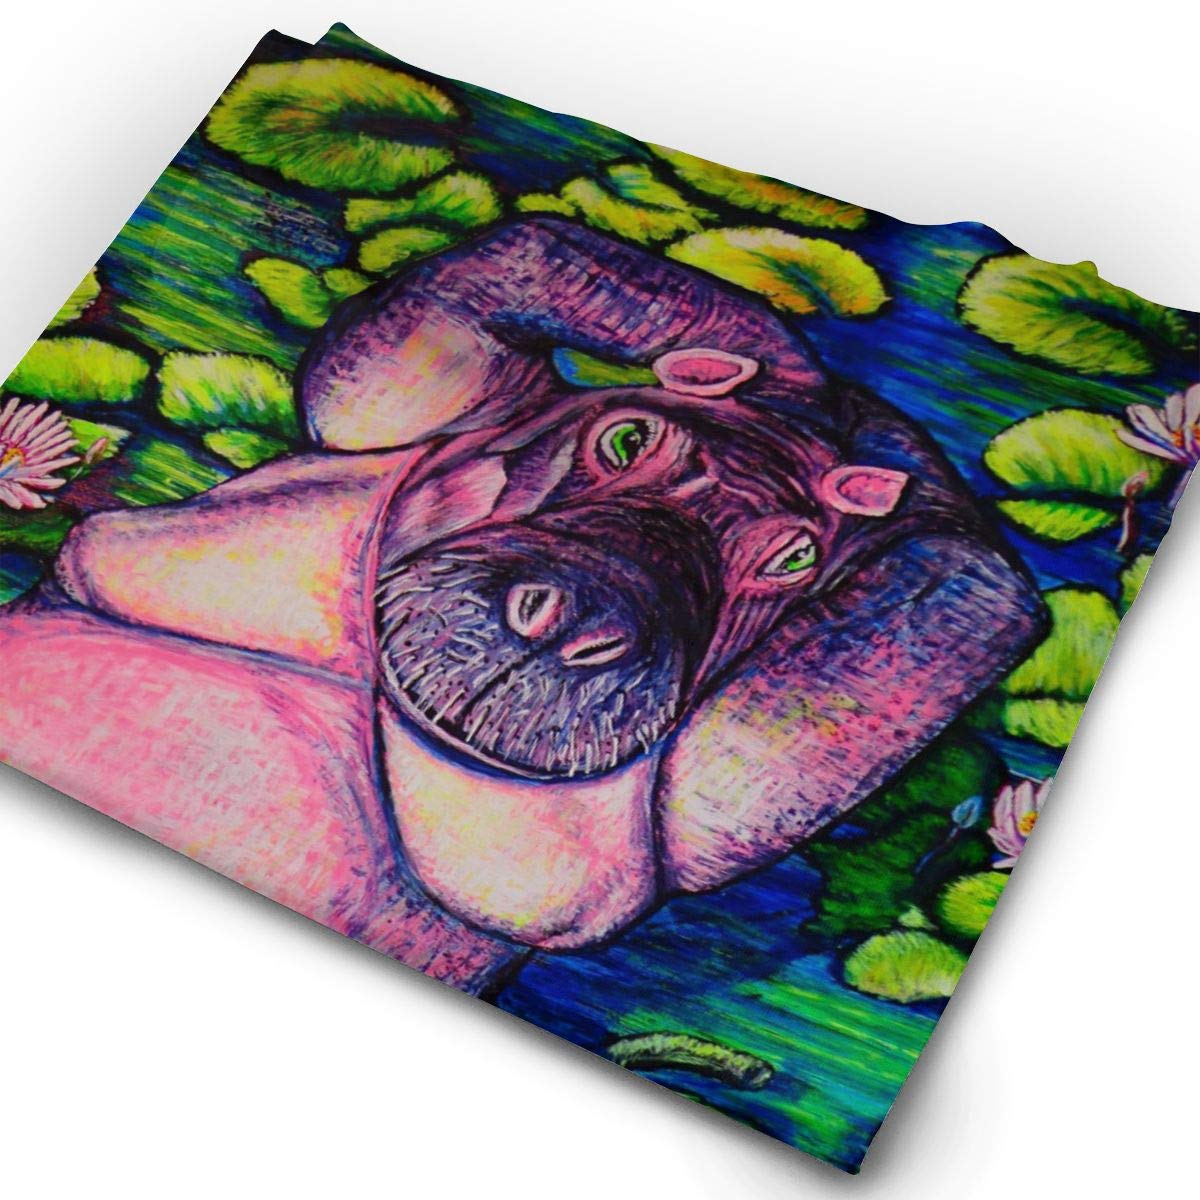 Headbands Hippo Headwear Bandana Sweatband Gaiter Head Wrap Mask Neck Outdoor Scarf